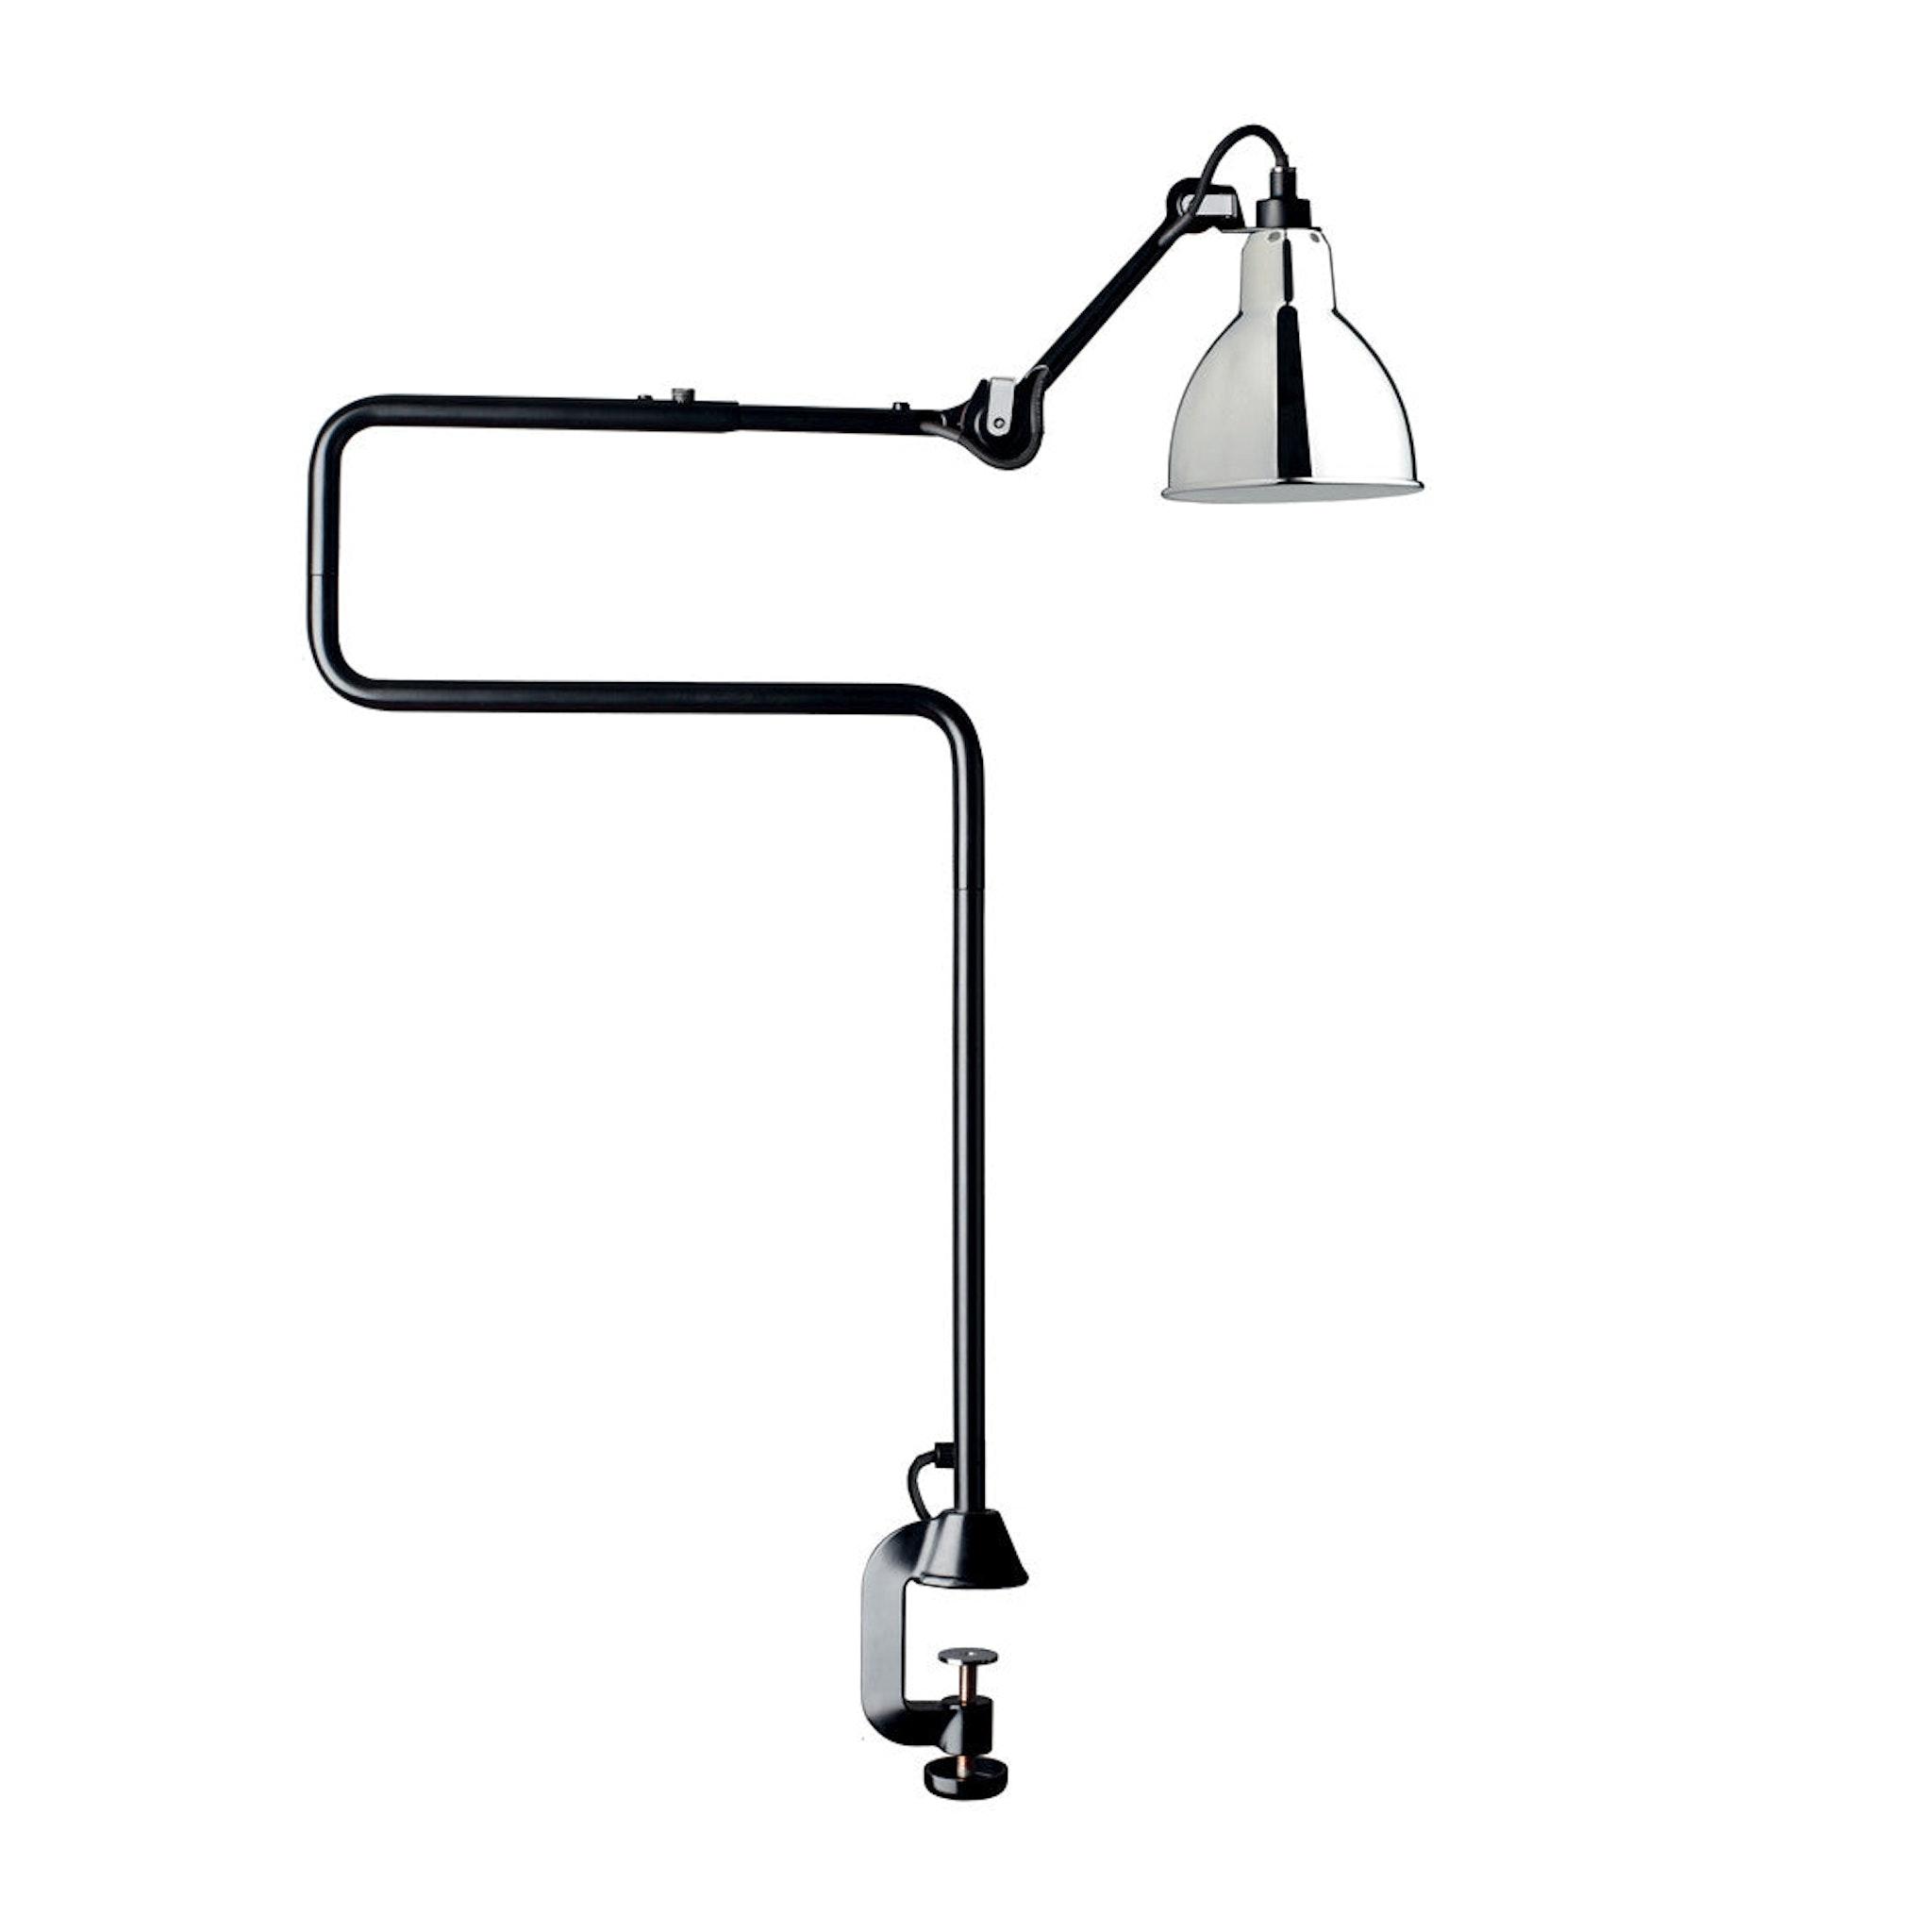 d1586f88c643 Lampe Gras 211-311 with clamp by La Lampe Gras — haus®